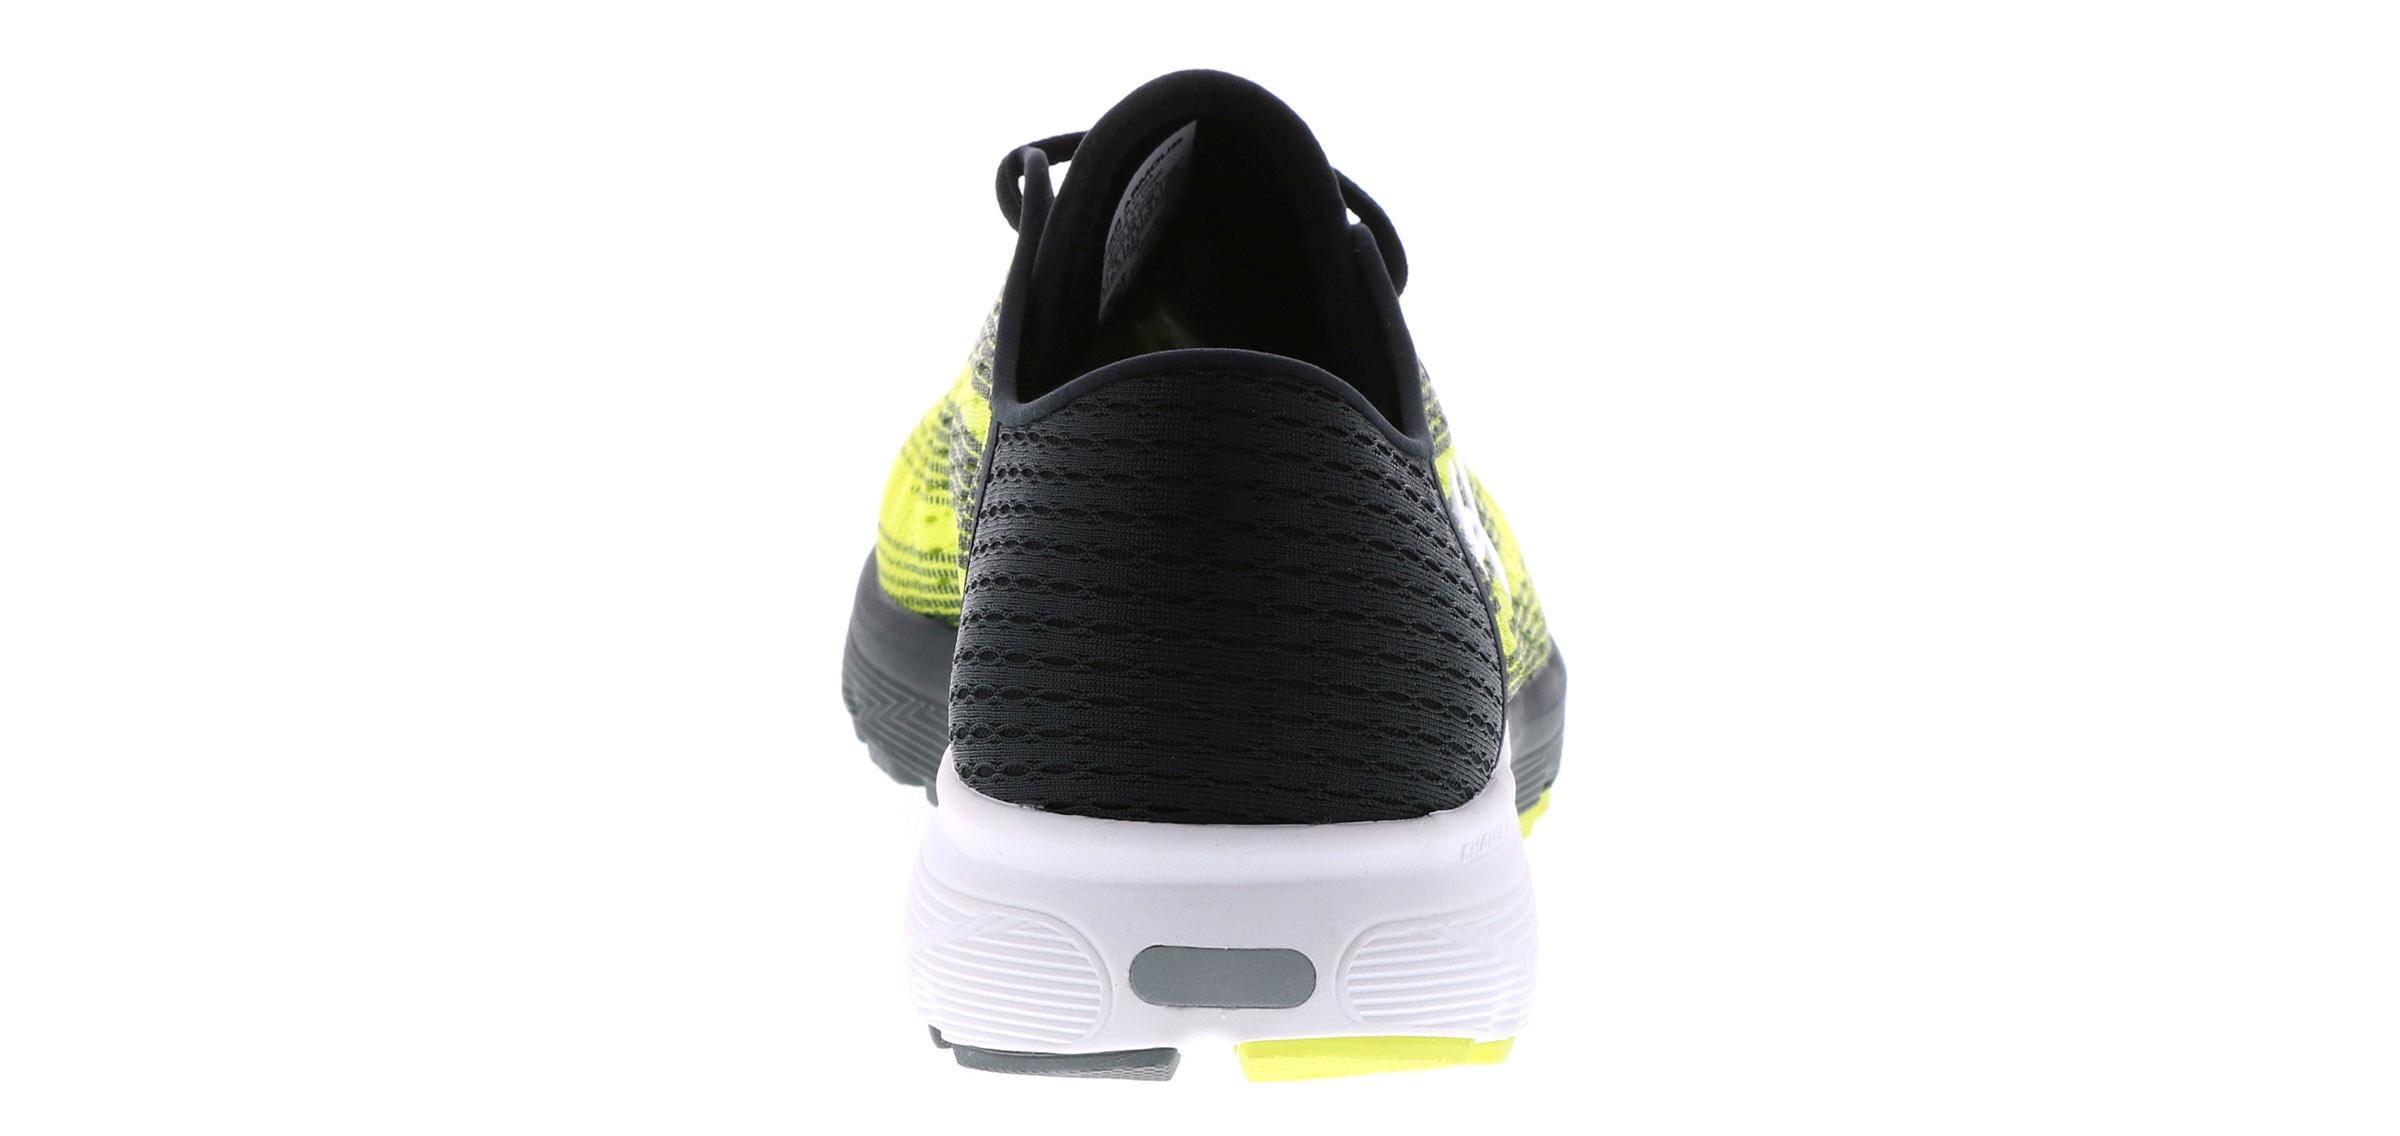 separation shoes 80b5c 5cbfd Men's Under Armour Speedform Velociti Yellow | Shoe Sensation